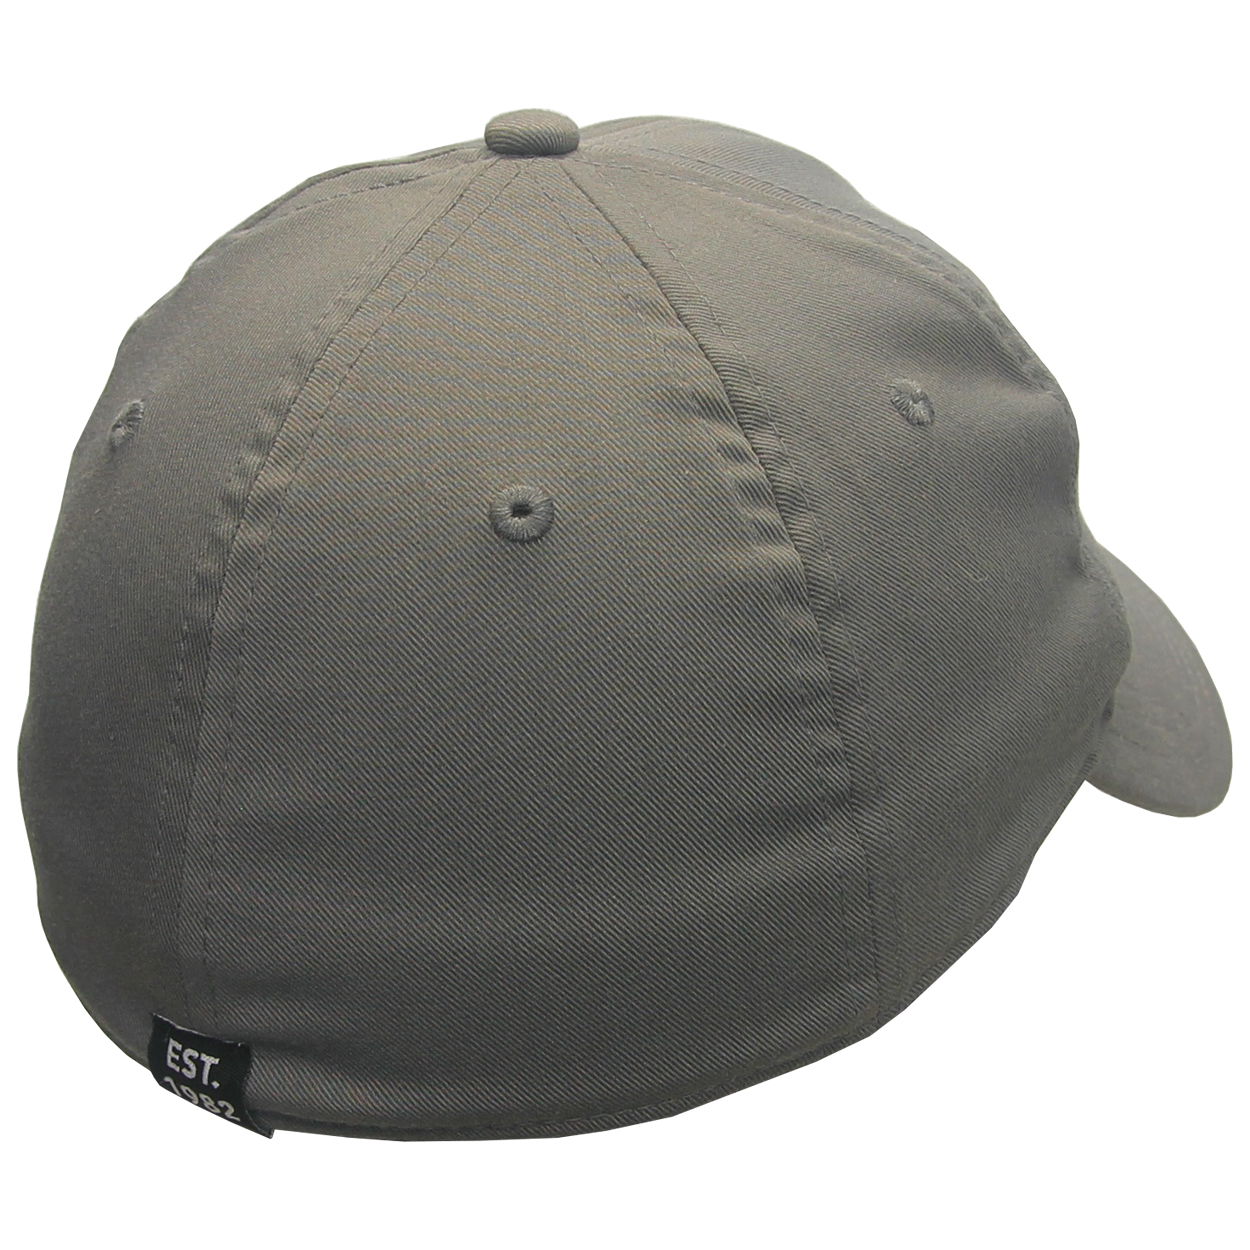 ba055b415e8 Callaway-Golf-CG82-Fitted-Hat-Brand-NEW